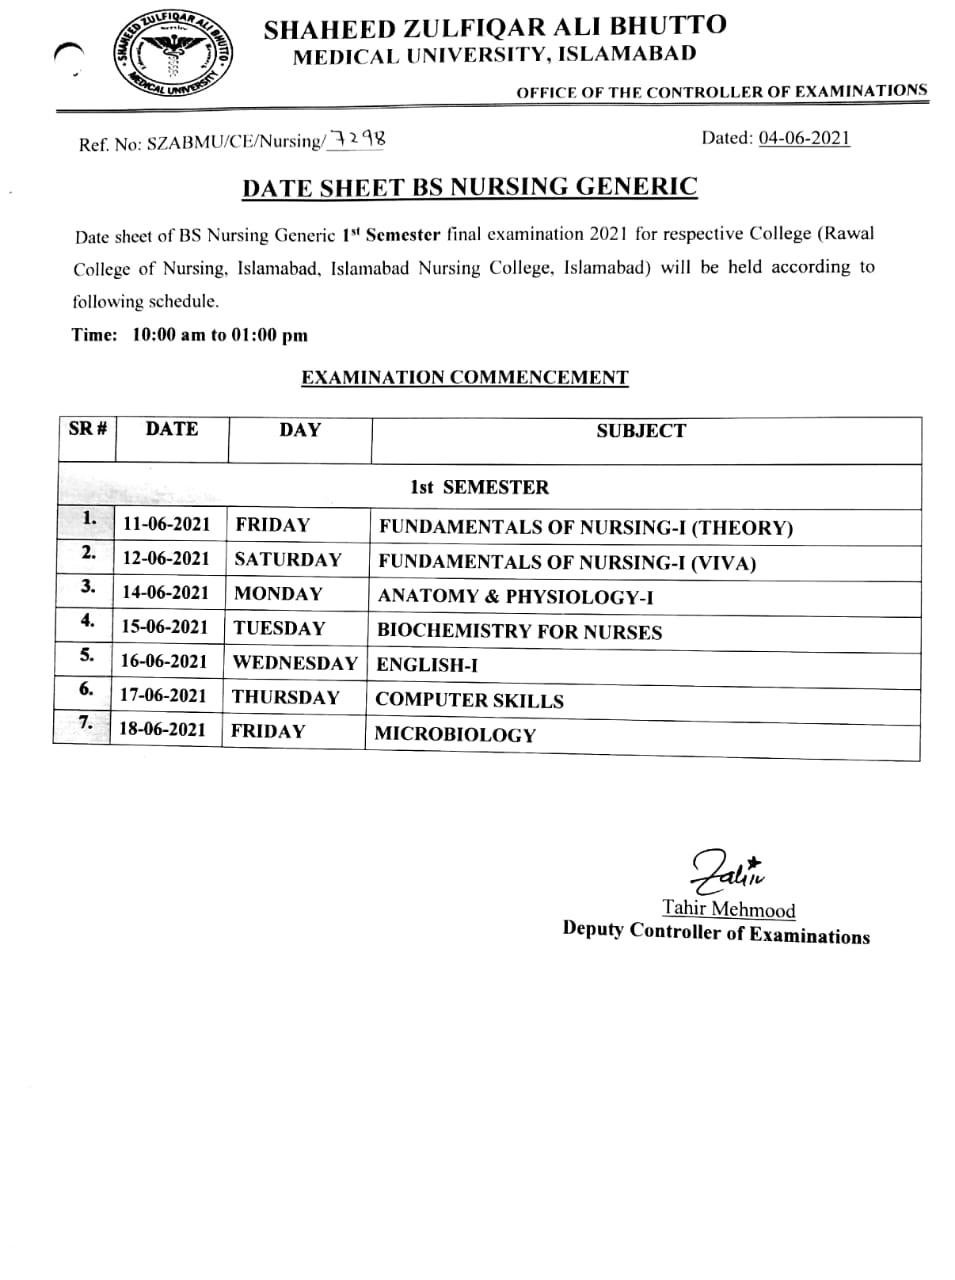 Date Sheet - BS Nursing Generic